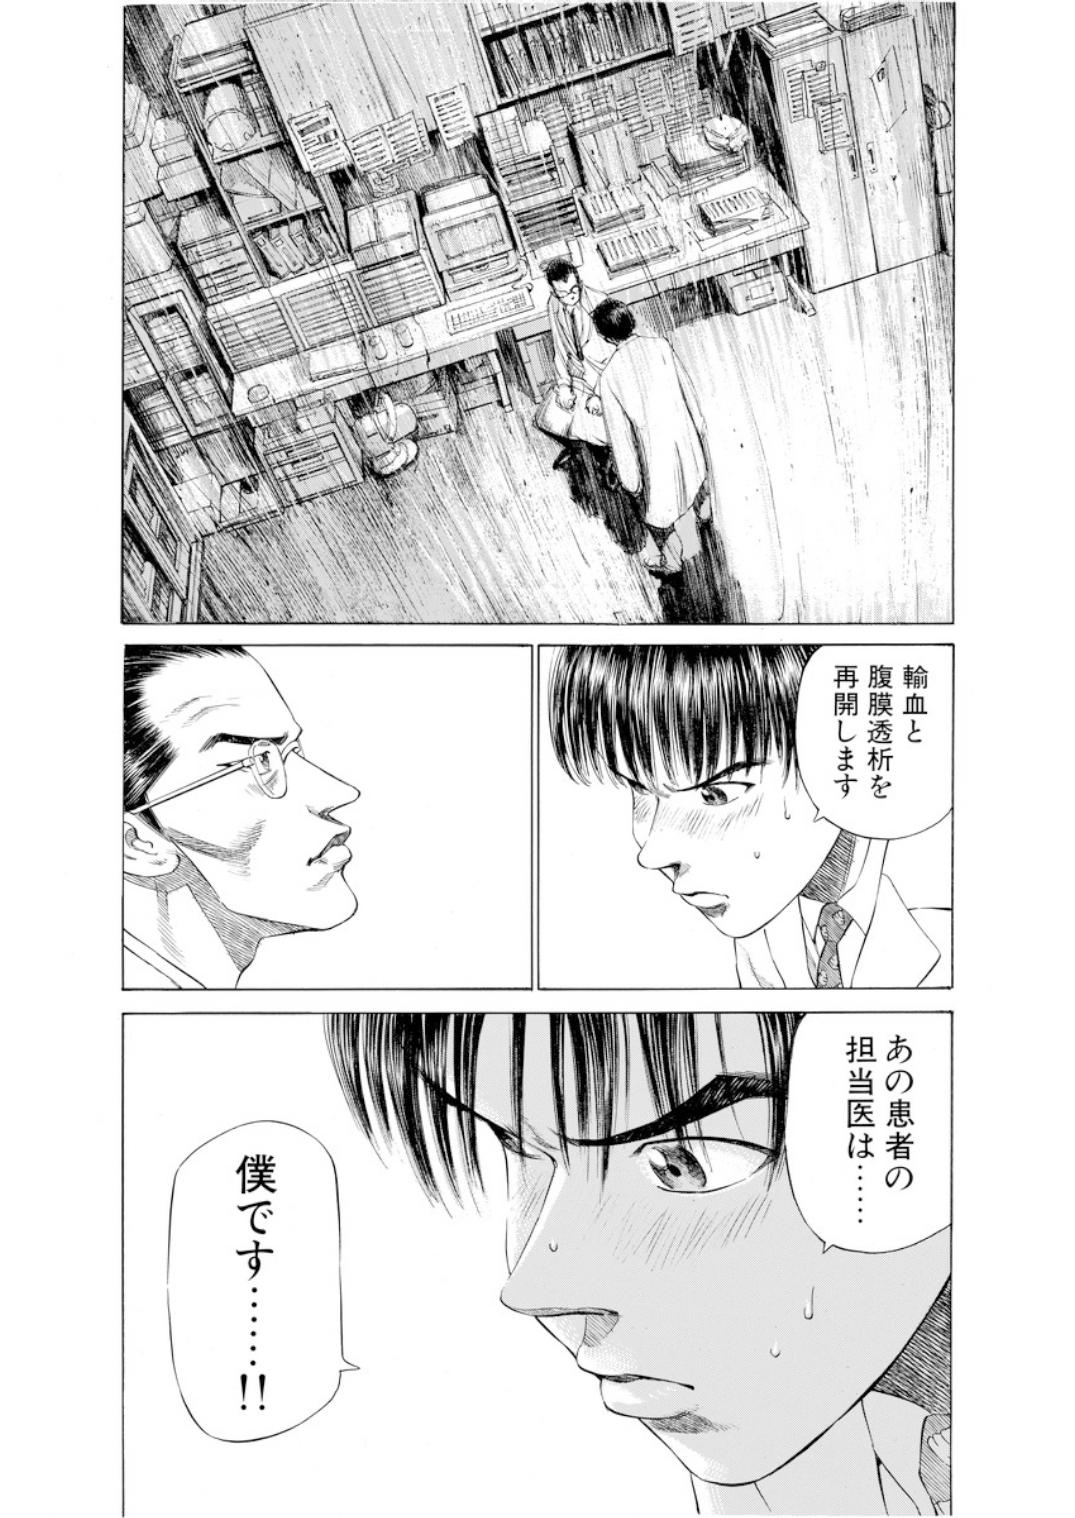 001bj_page-0131.jpg